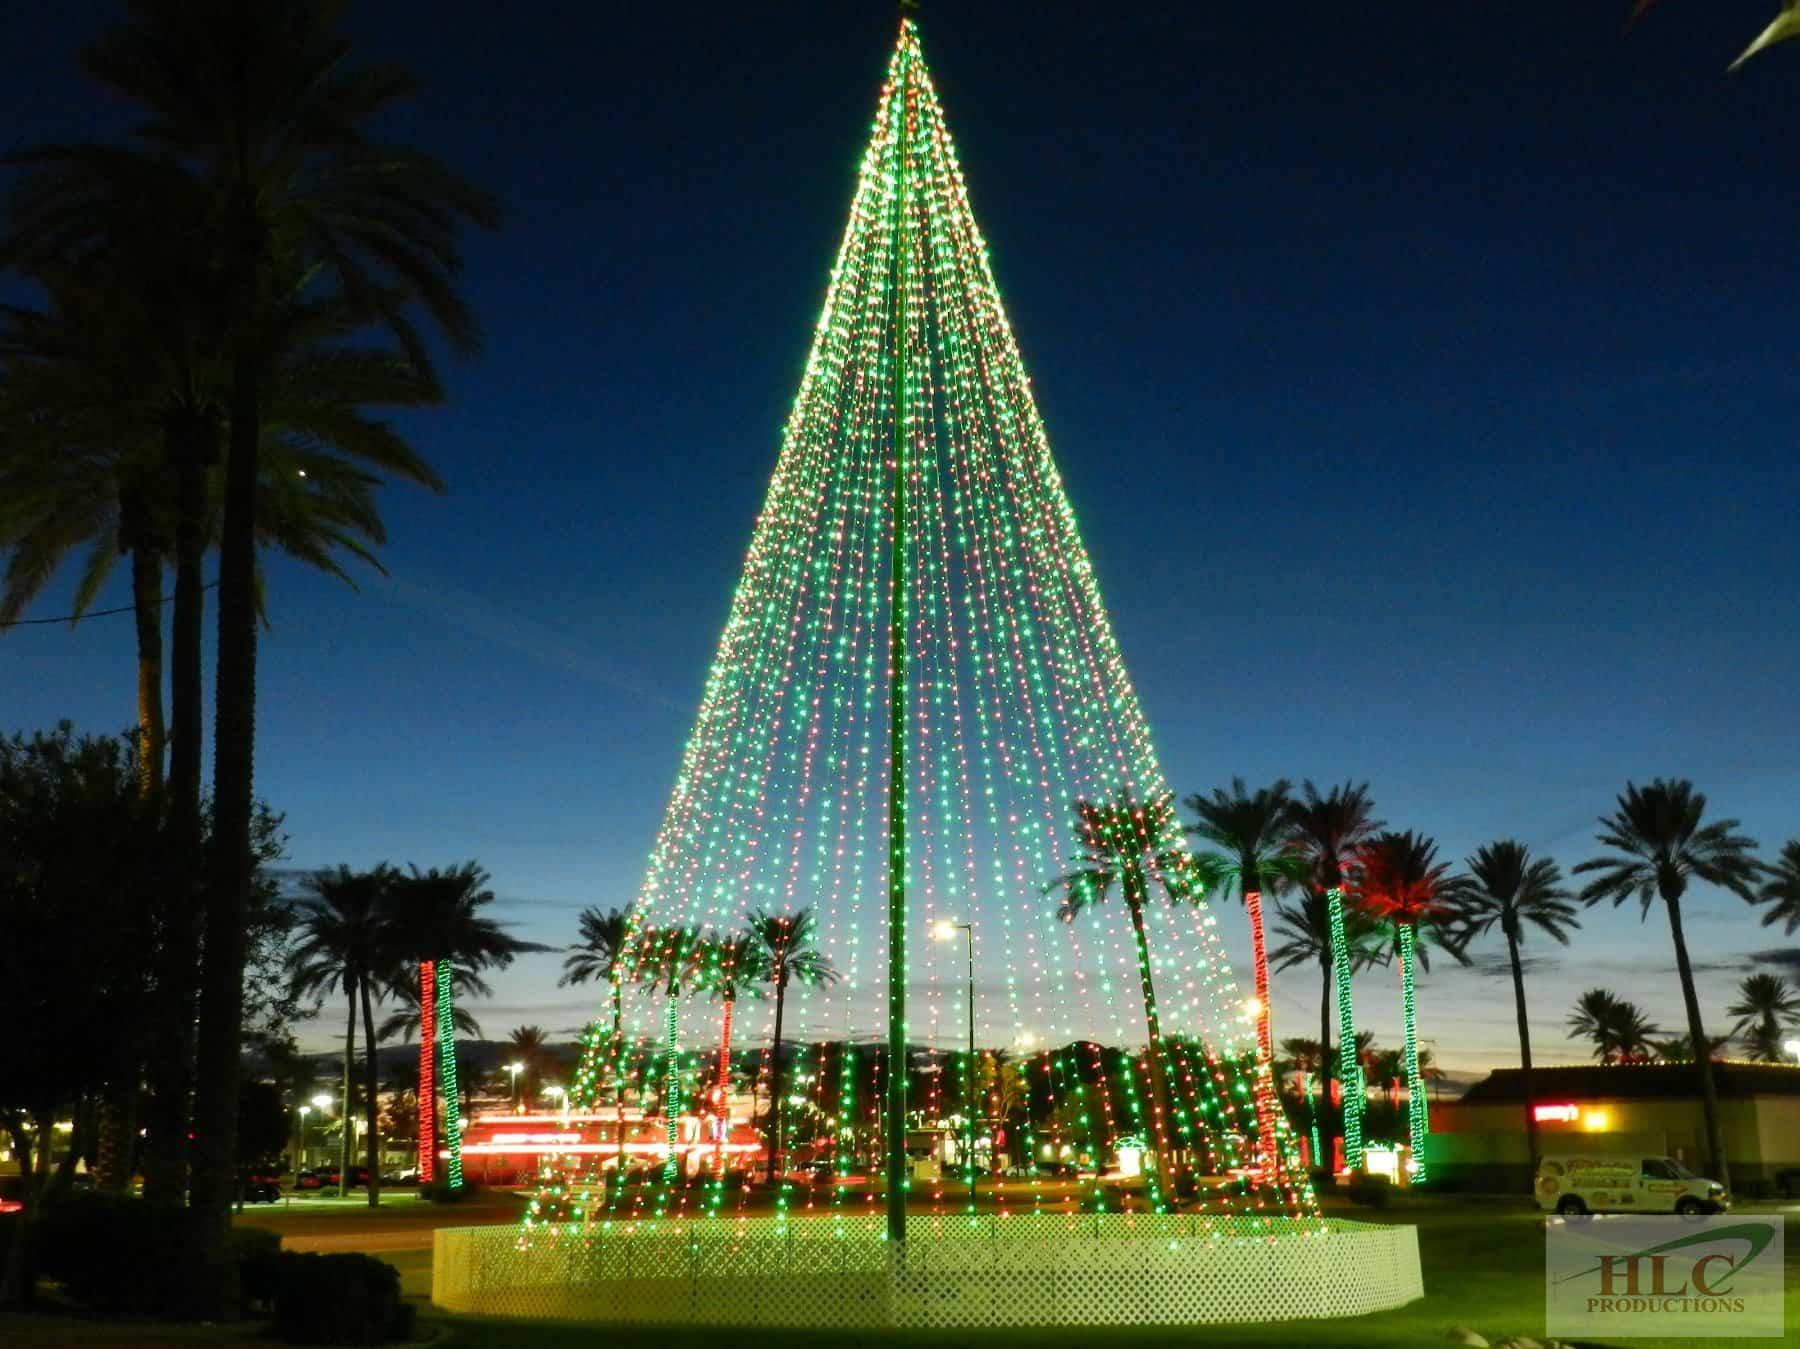 80ft Tree of Lights